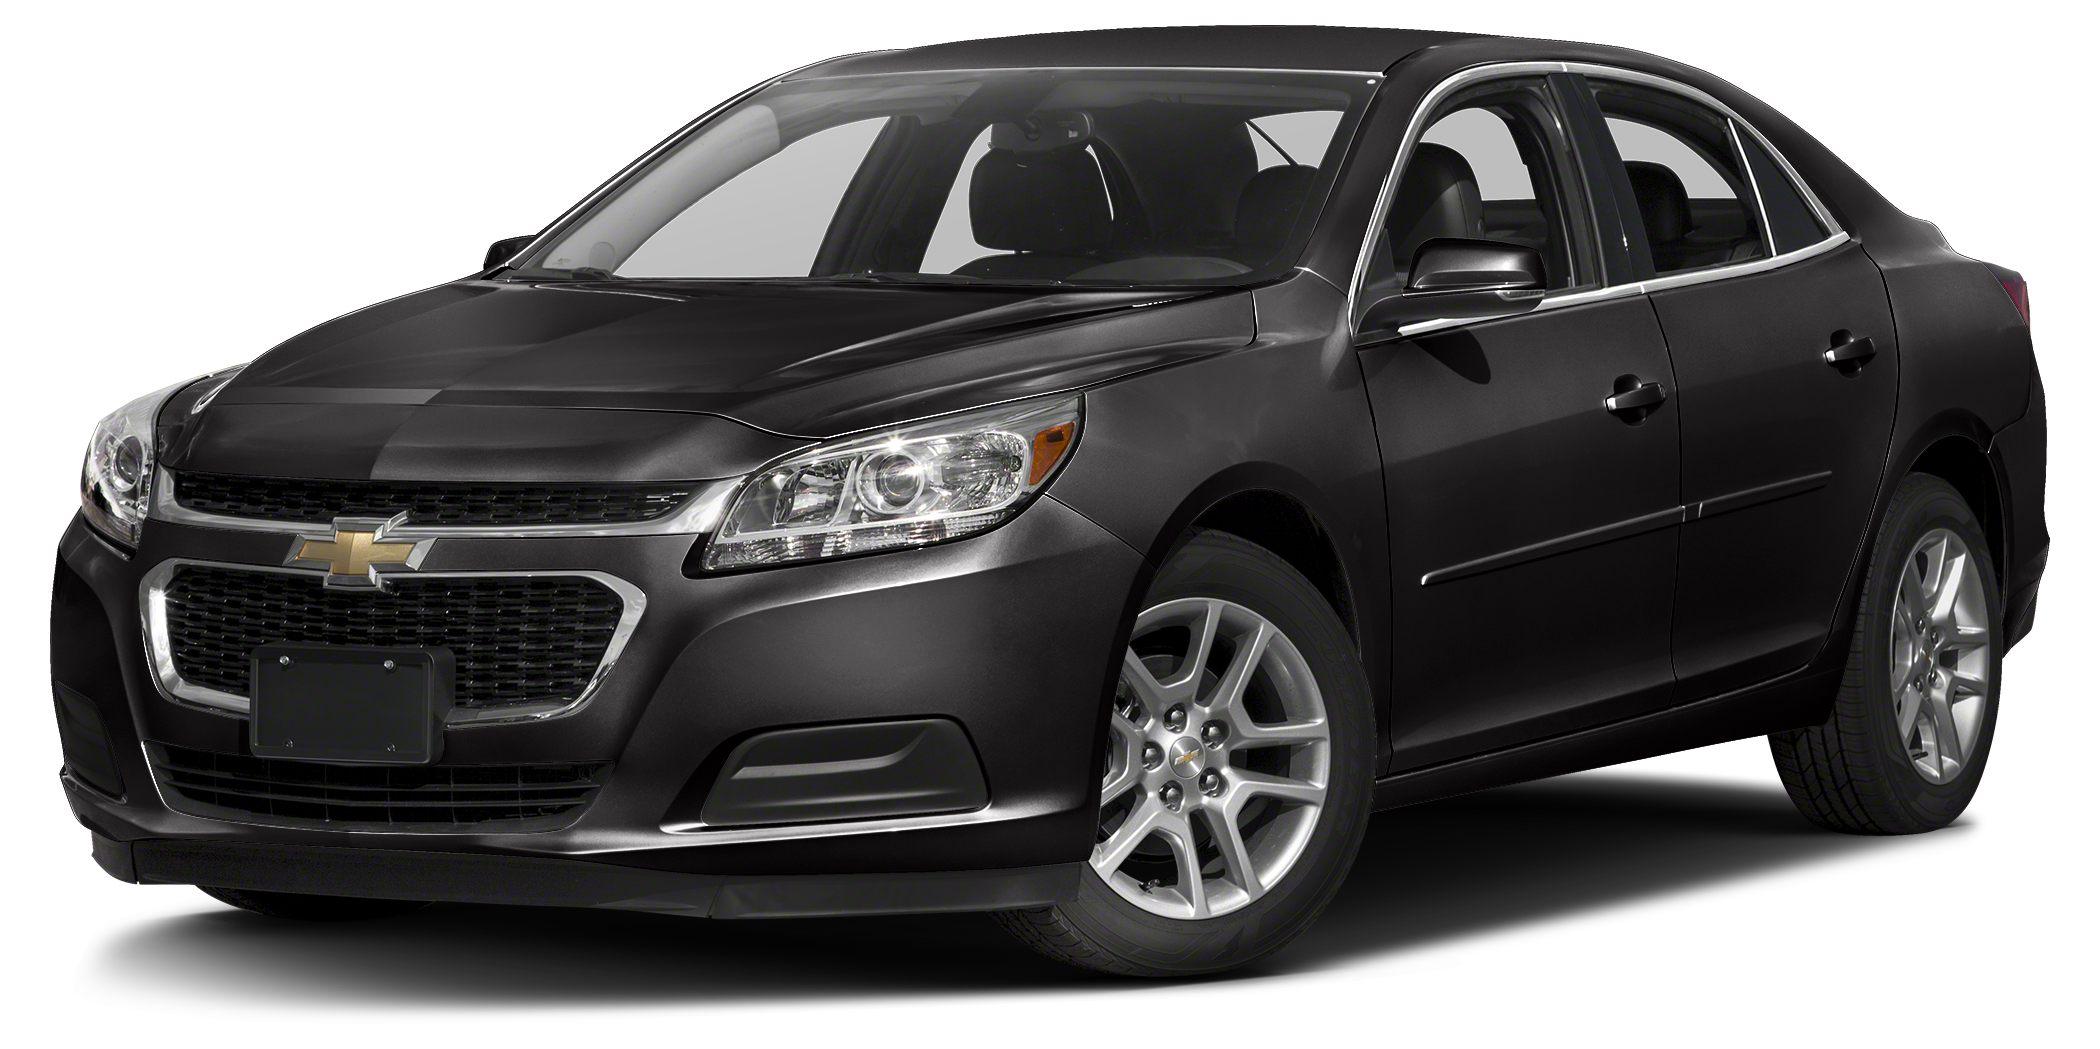 2016 Chevrolet Malibu Limited LT 24 MPG City34 MPG Highway Malibu Limi